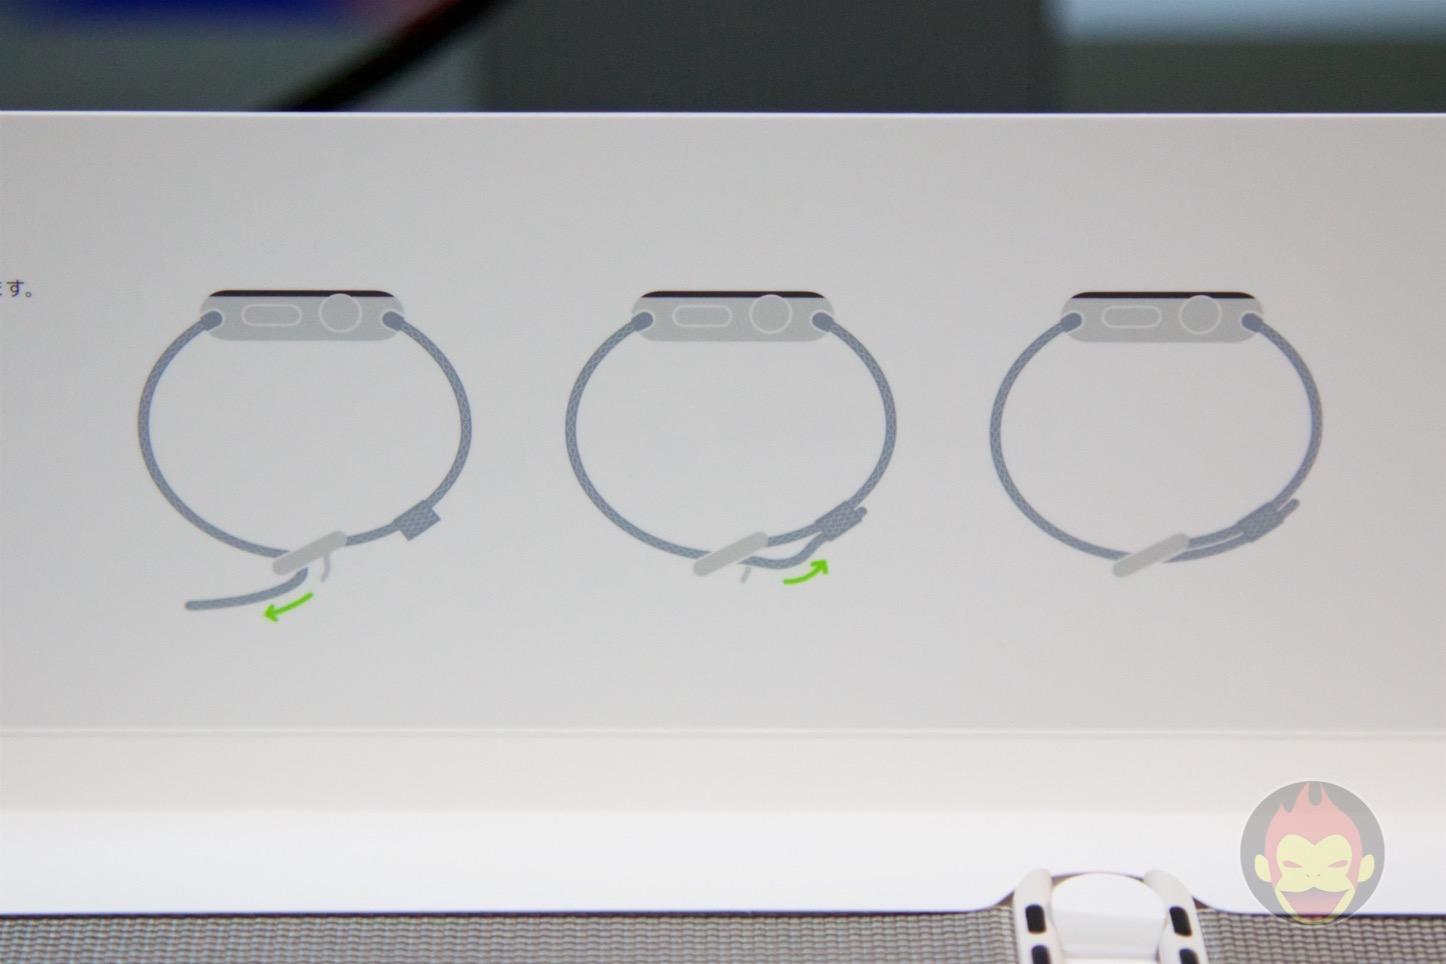 Apple-Watch-Woven-Nylon-Band-03.jpg